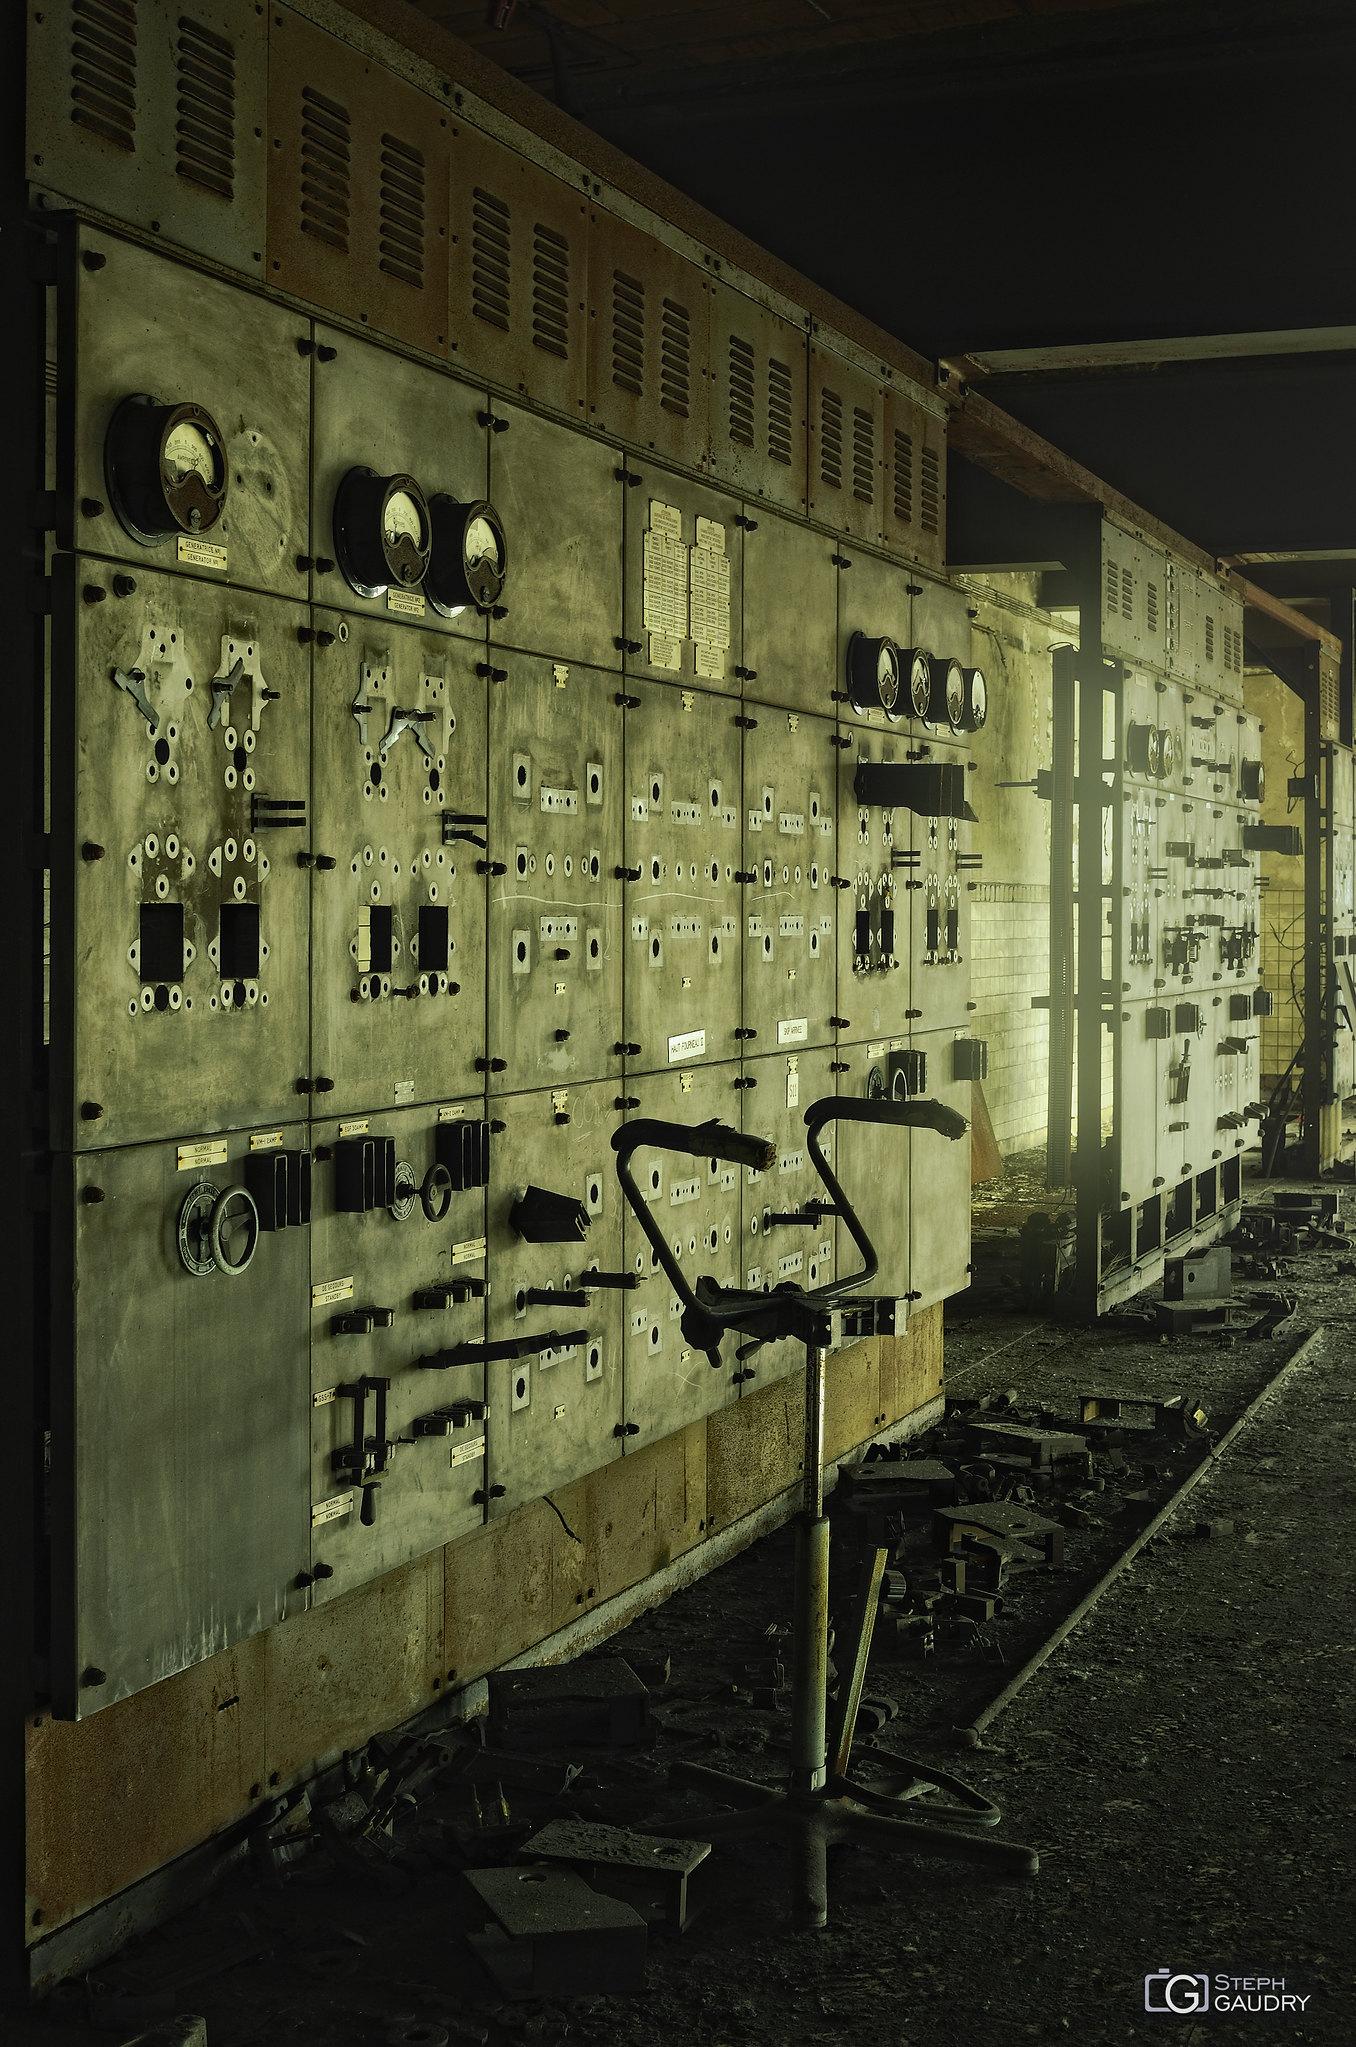 HF Powerstation [Klik om de diavoorstelling te starten]